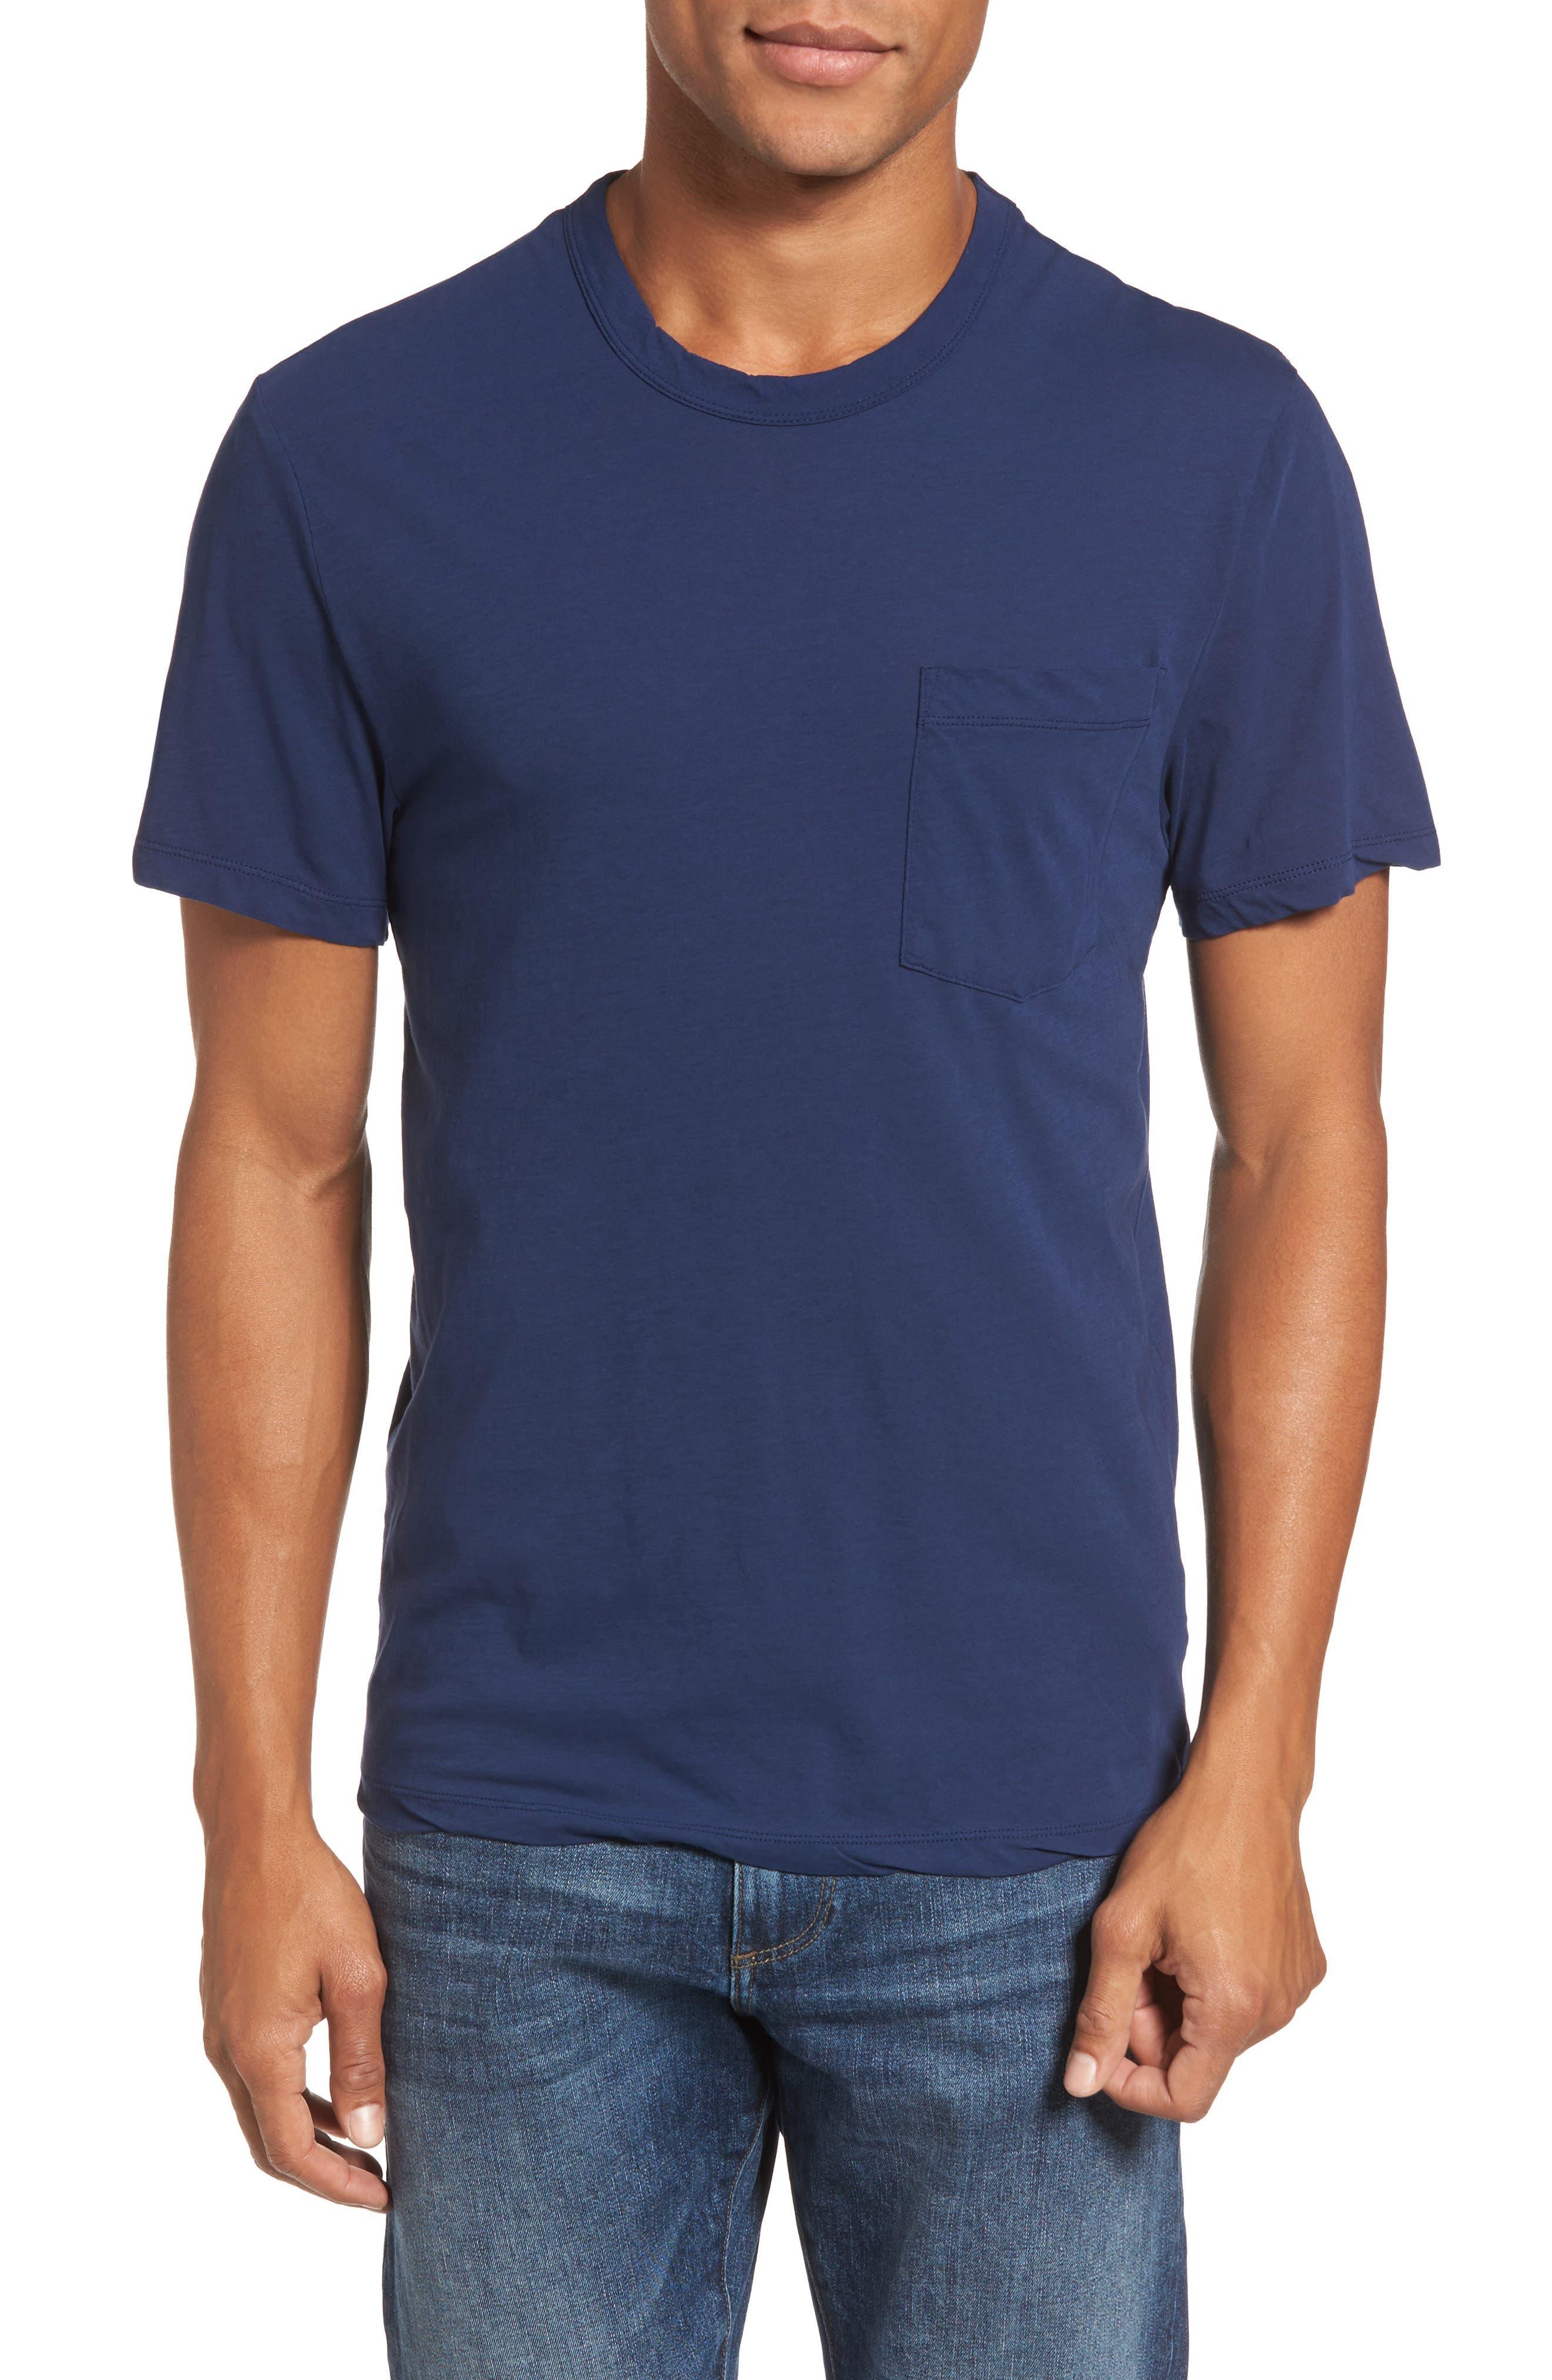 James Perse High Twist Jersey Crewneck T-Shirt